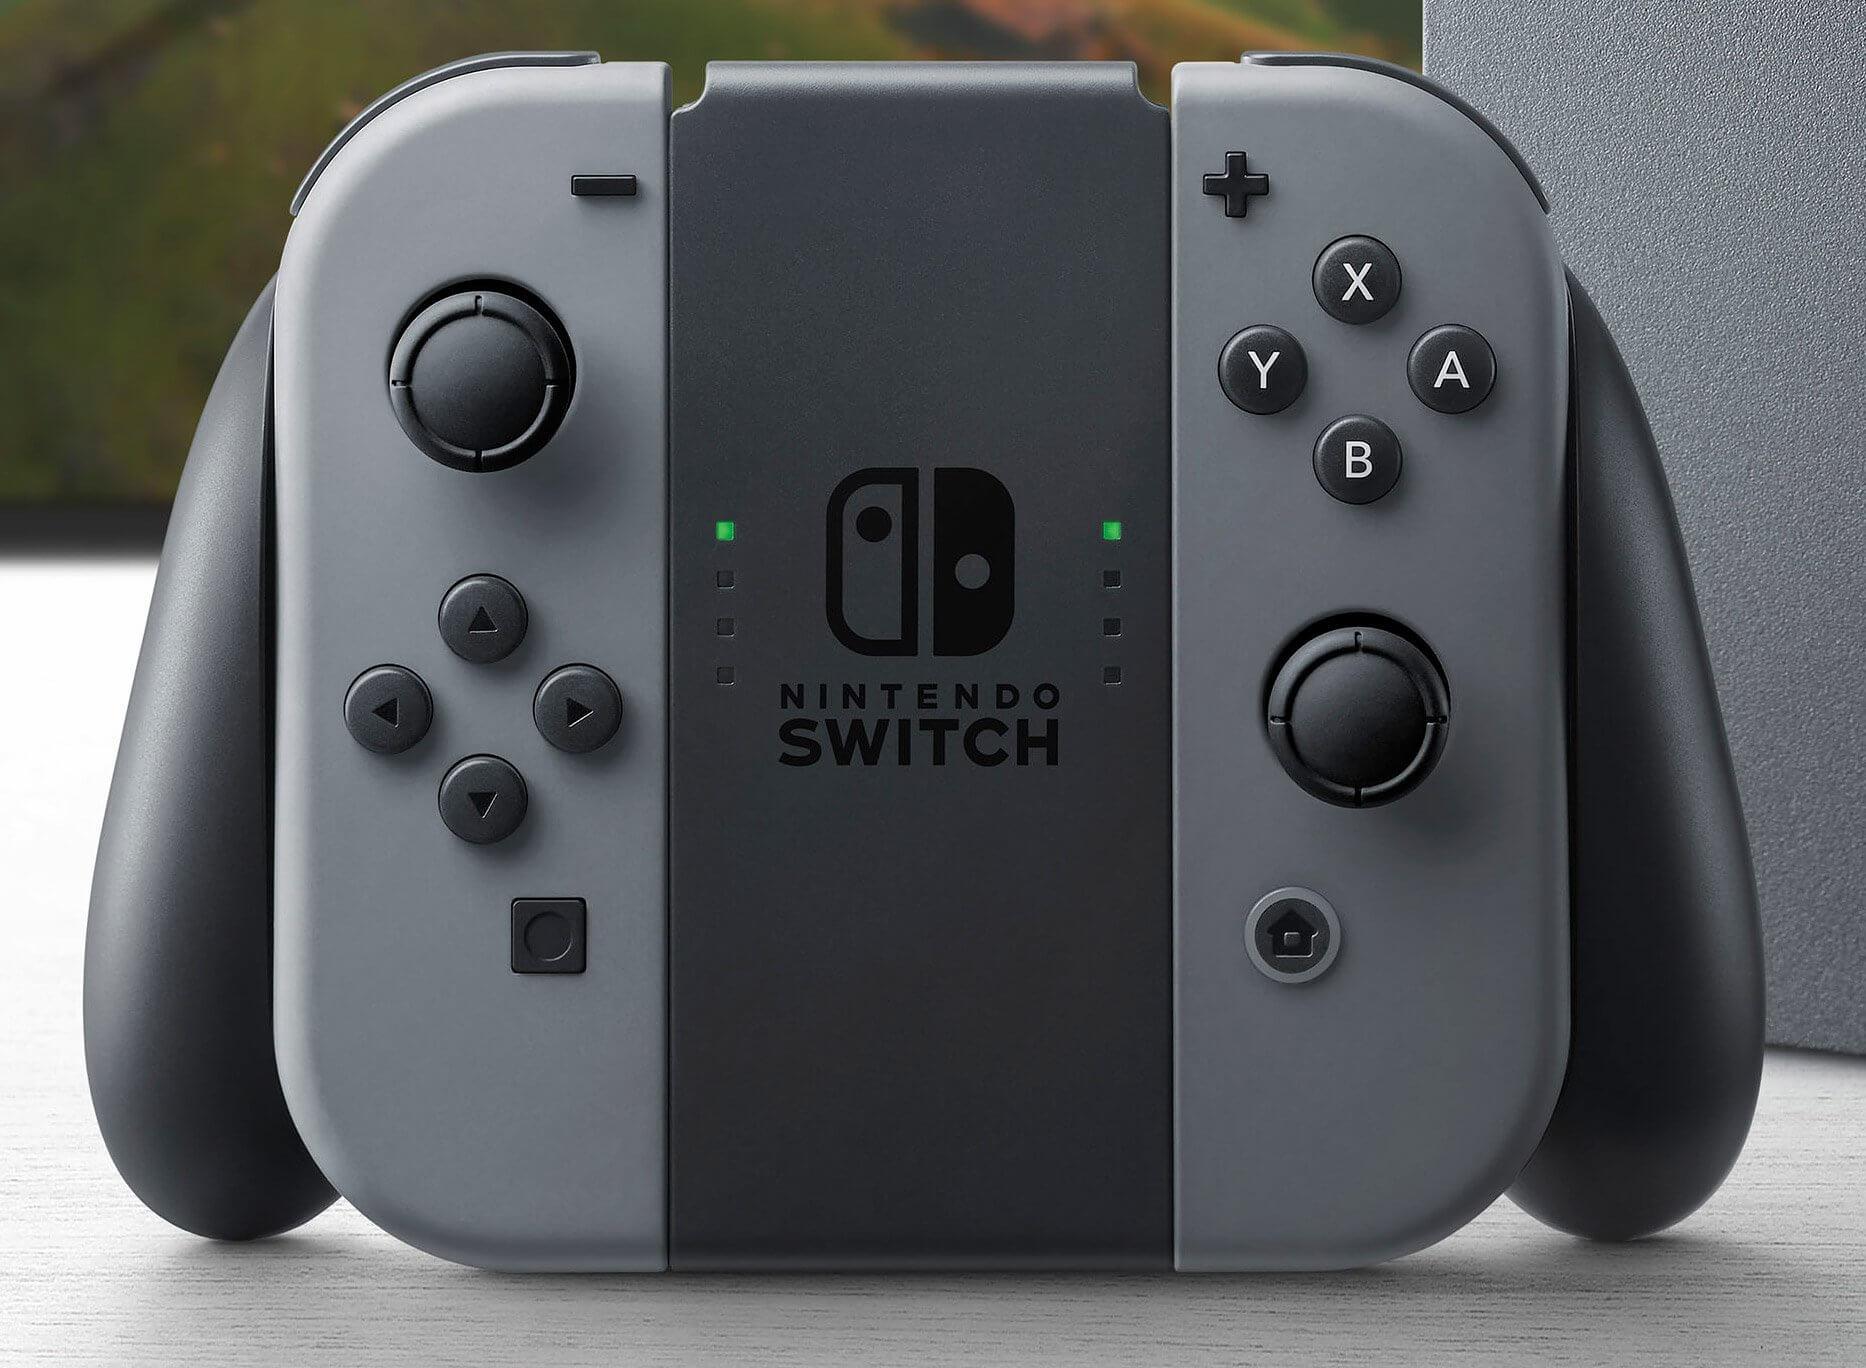 The Joy-Con controller for the Nintendo Switch.